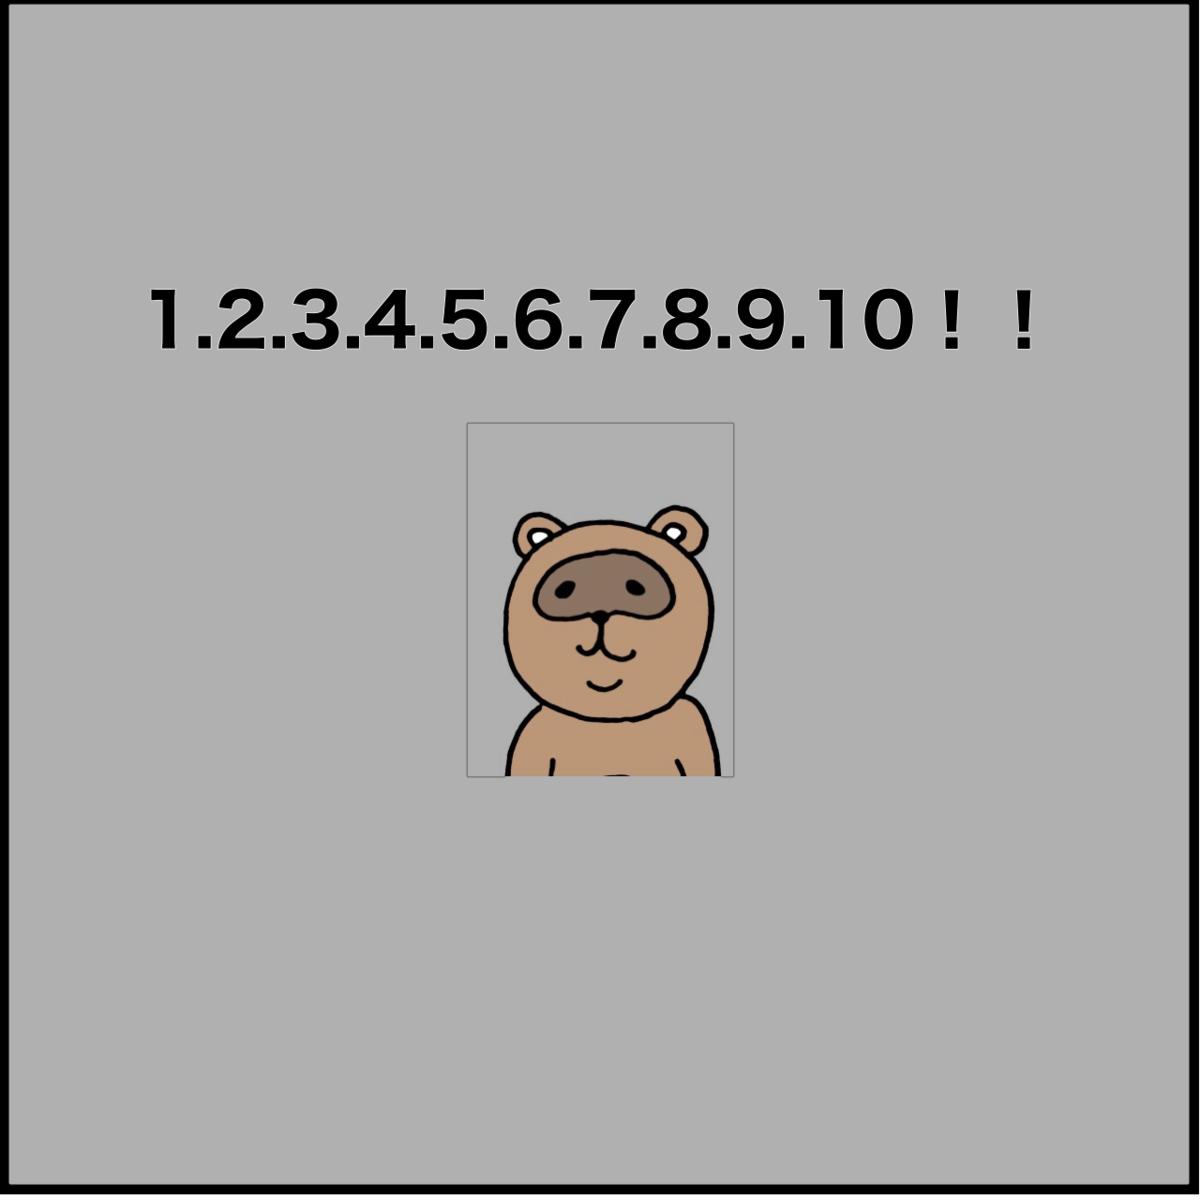 f:id:kinoko1629:20211014000819p:plain